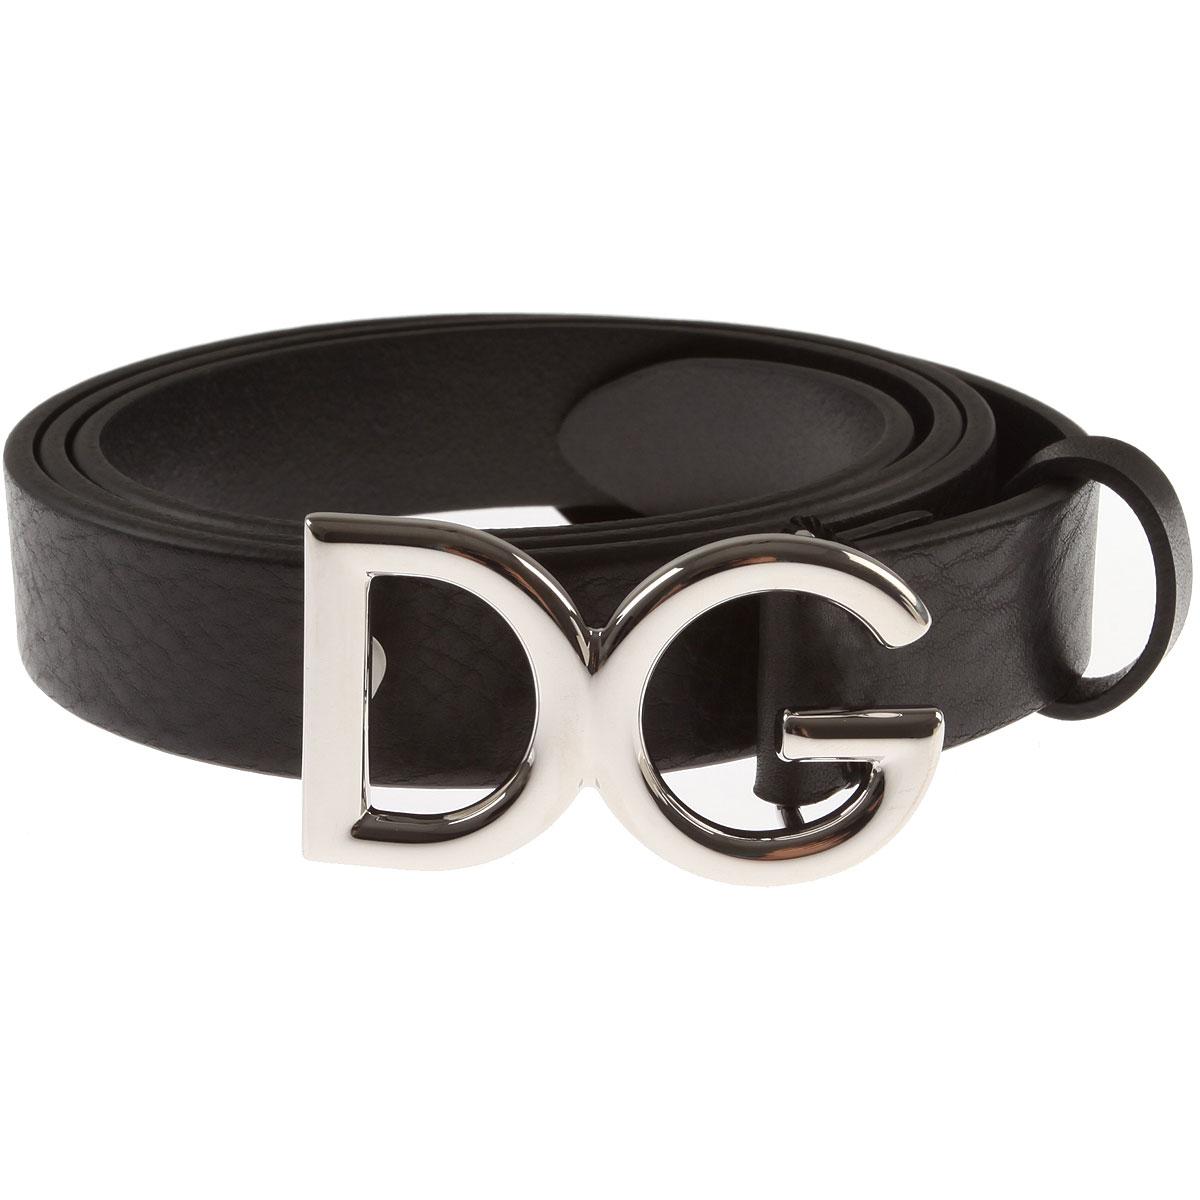 Image of Dolce & Gabbana Belts, Black, Leather, 2017, 40 42 44 48